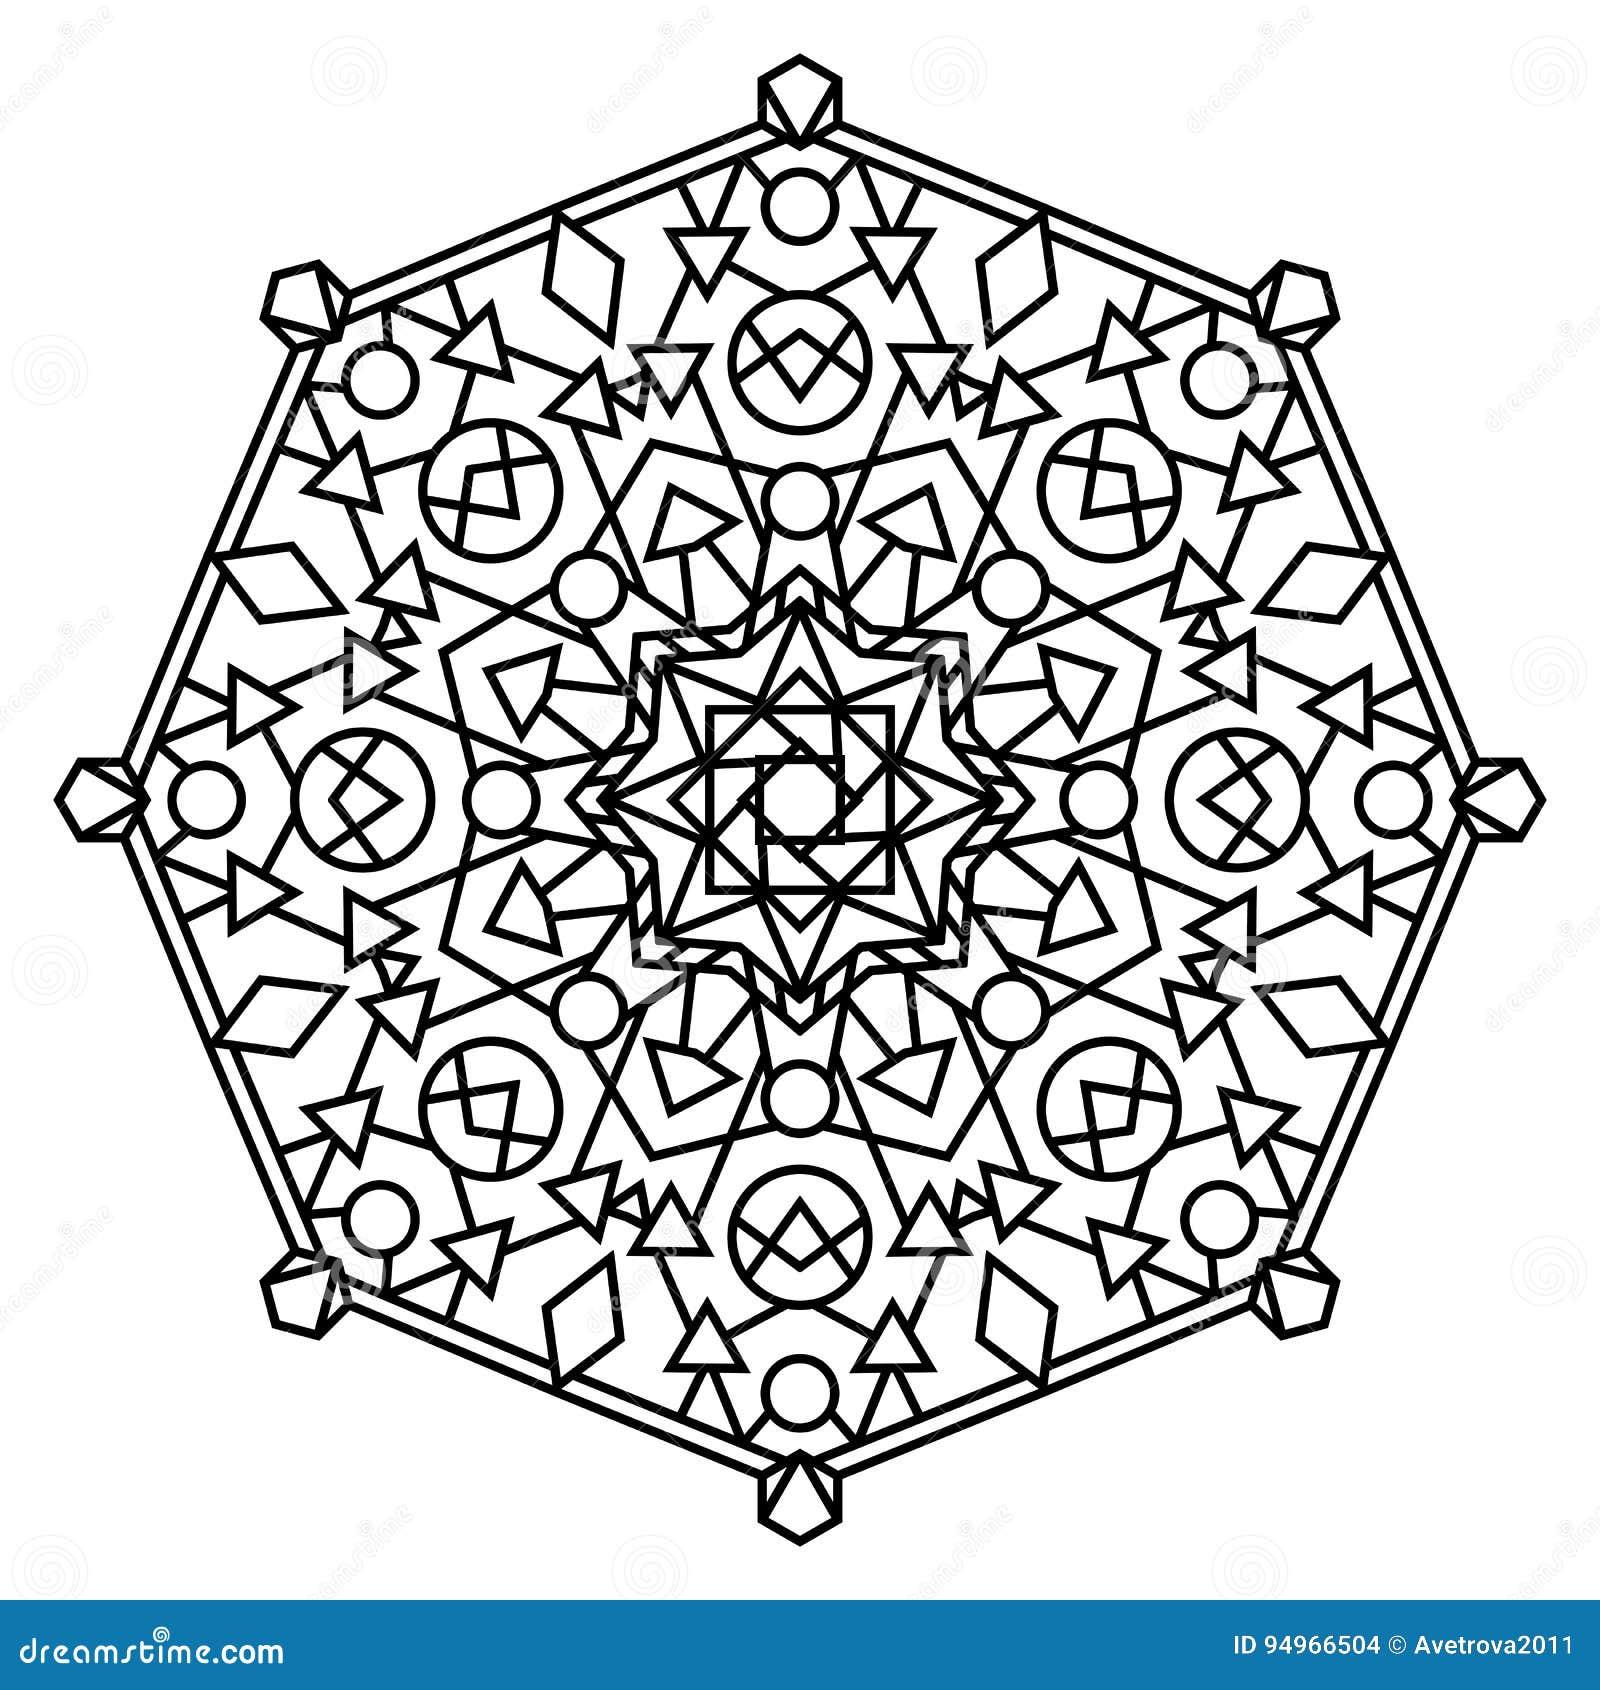 Intricate Geometric Mandala Isolated On White Background. Geometric ...